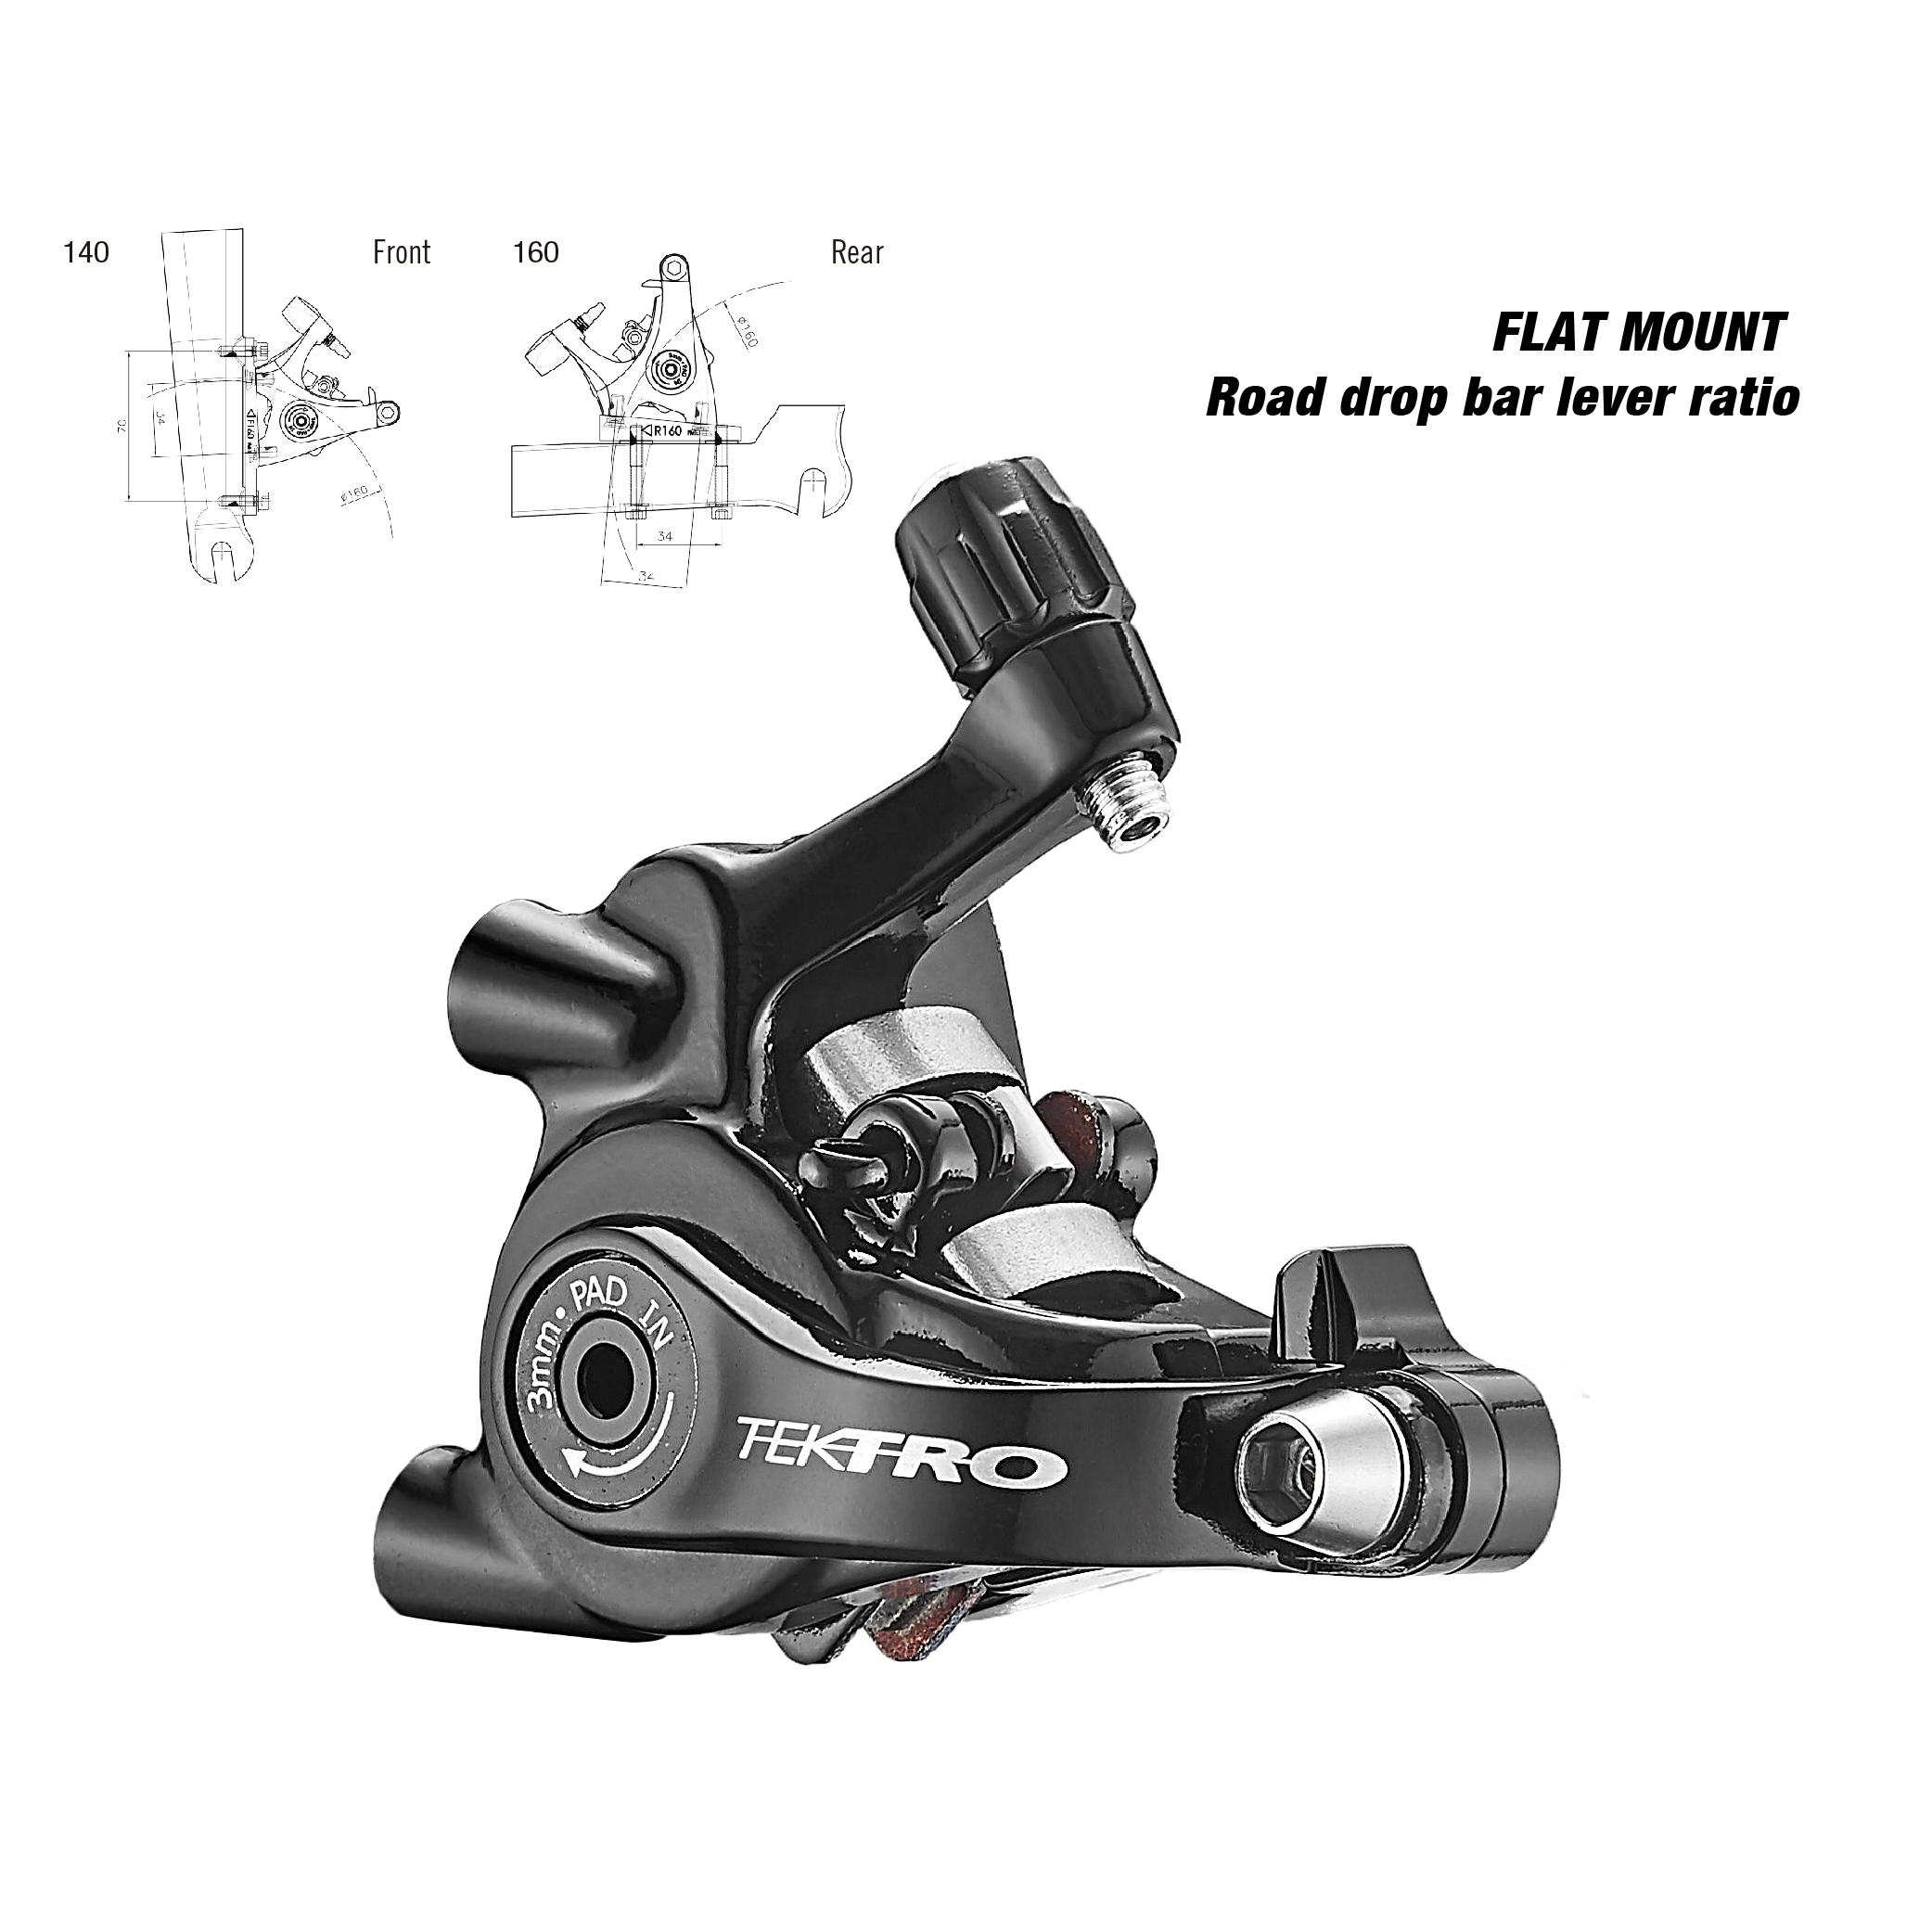 Etrier-de-frein-route-tektro-md-c550-flat-mount-noir